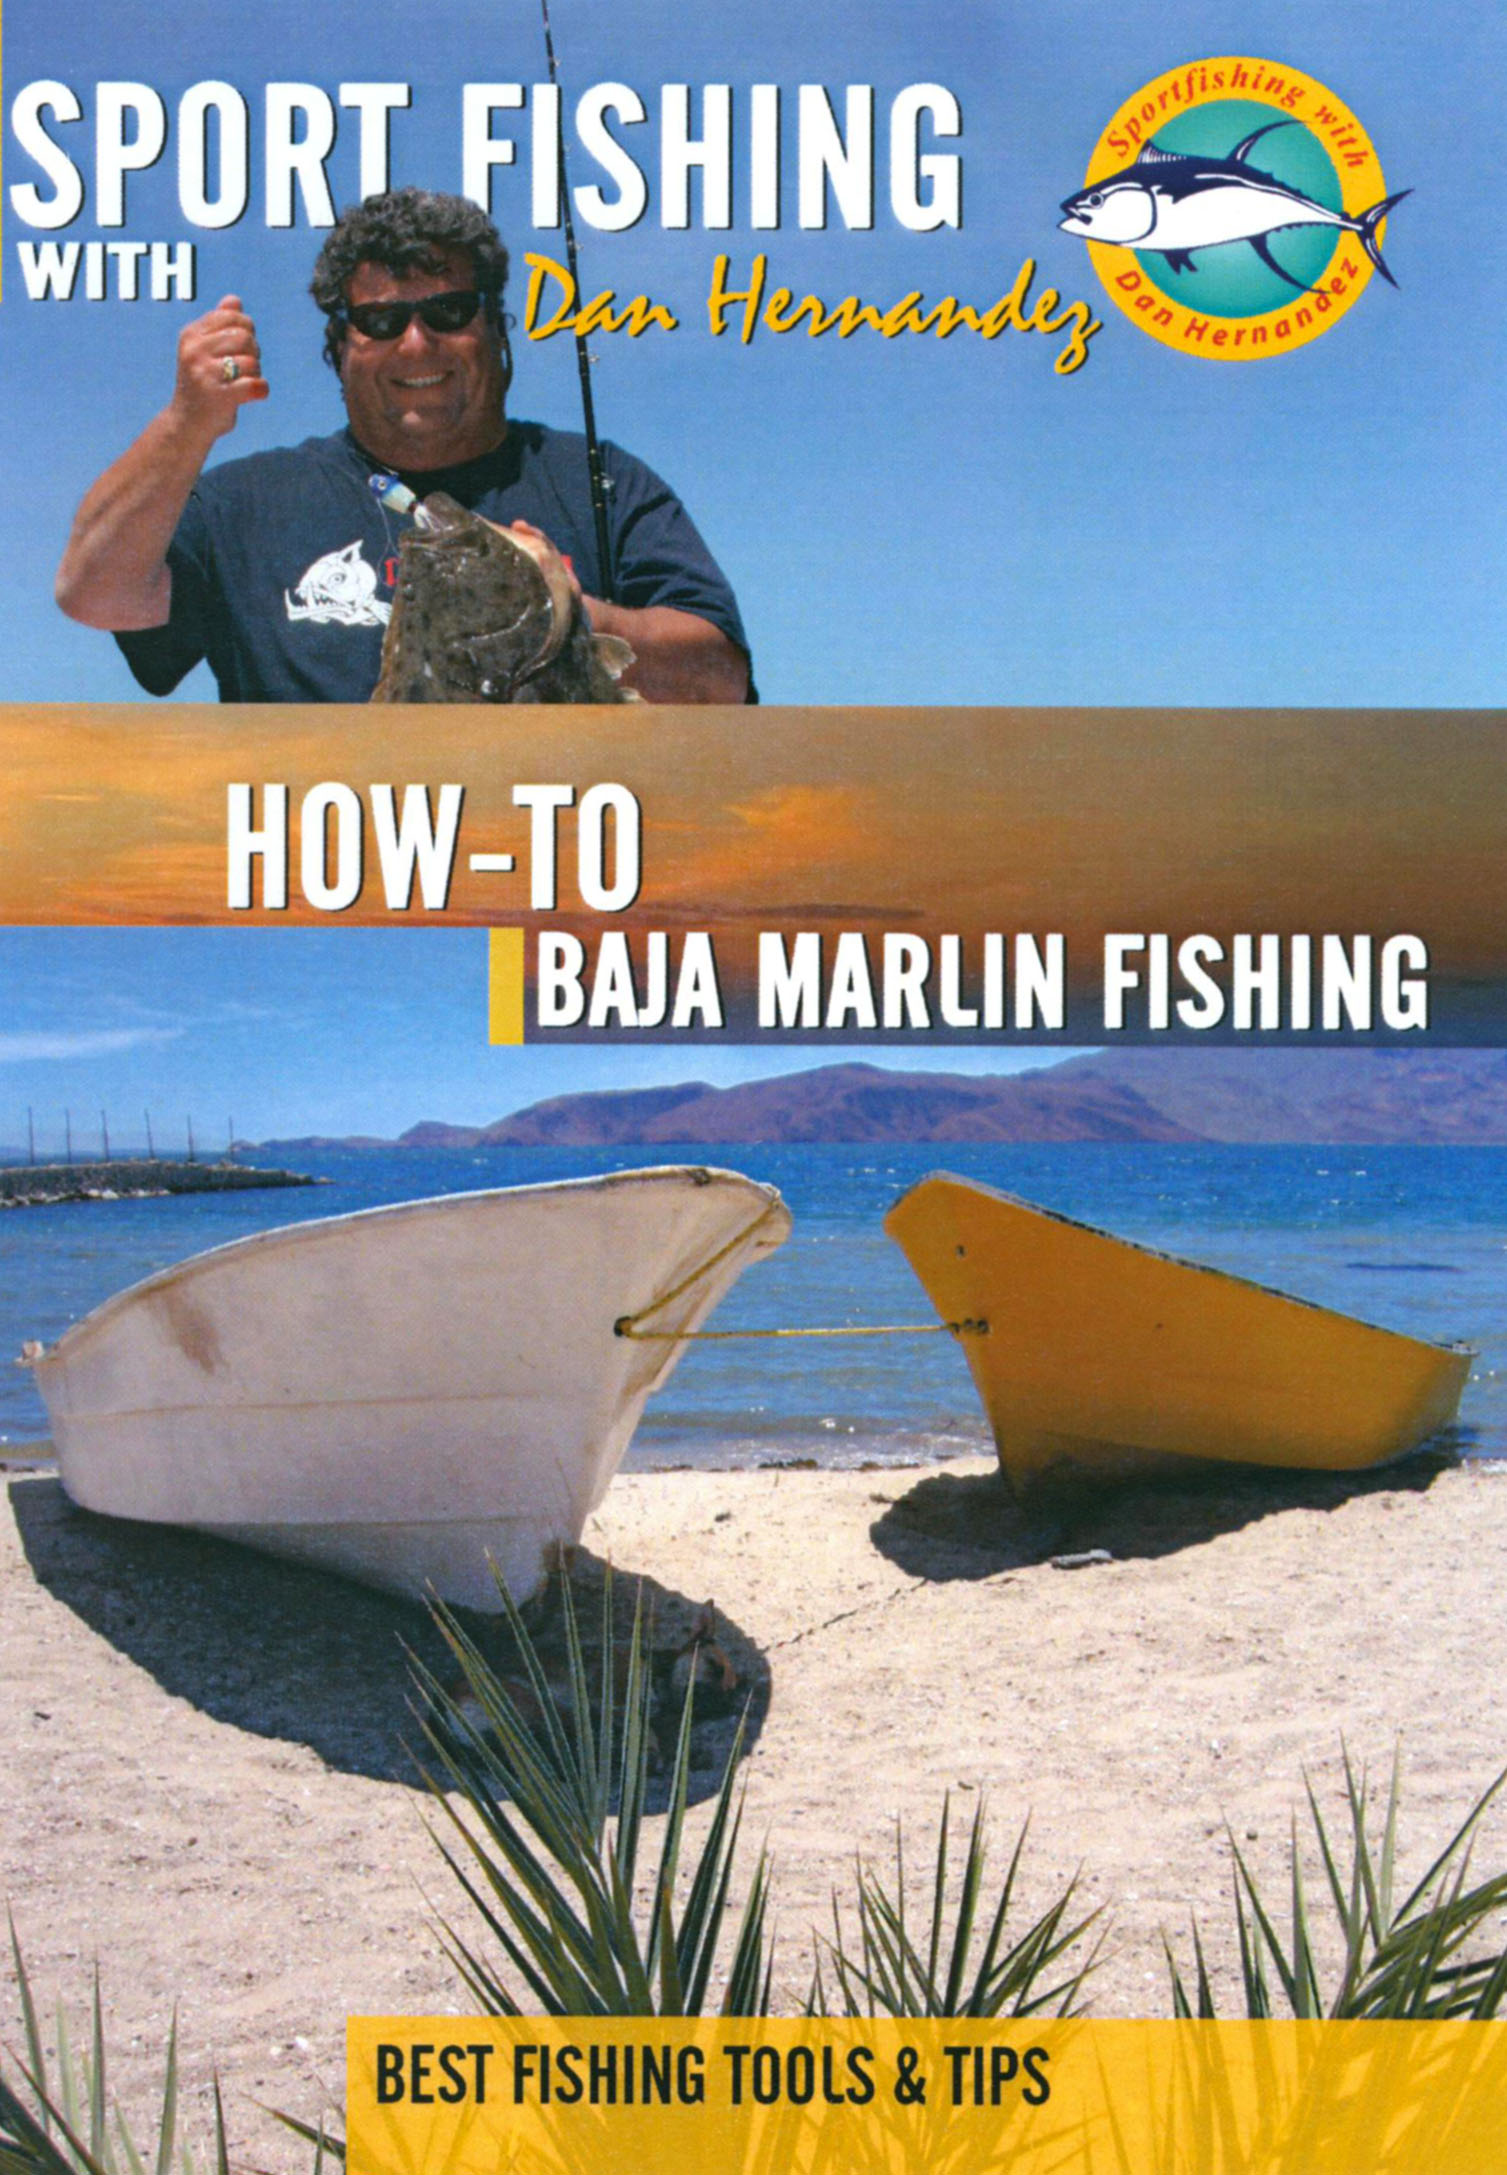 Sport Fishing With Dan Hernandez: How-To Baja Marlin Fishing